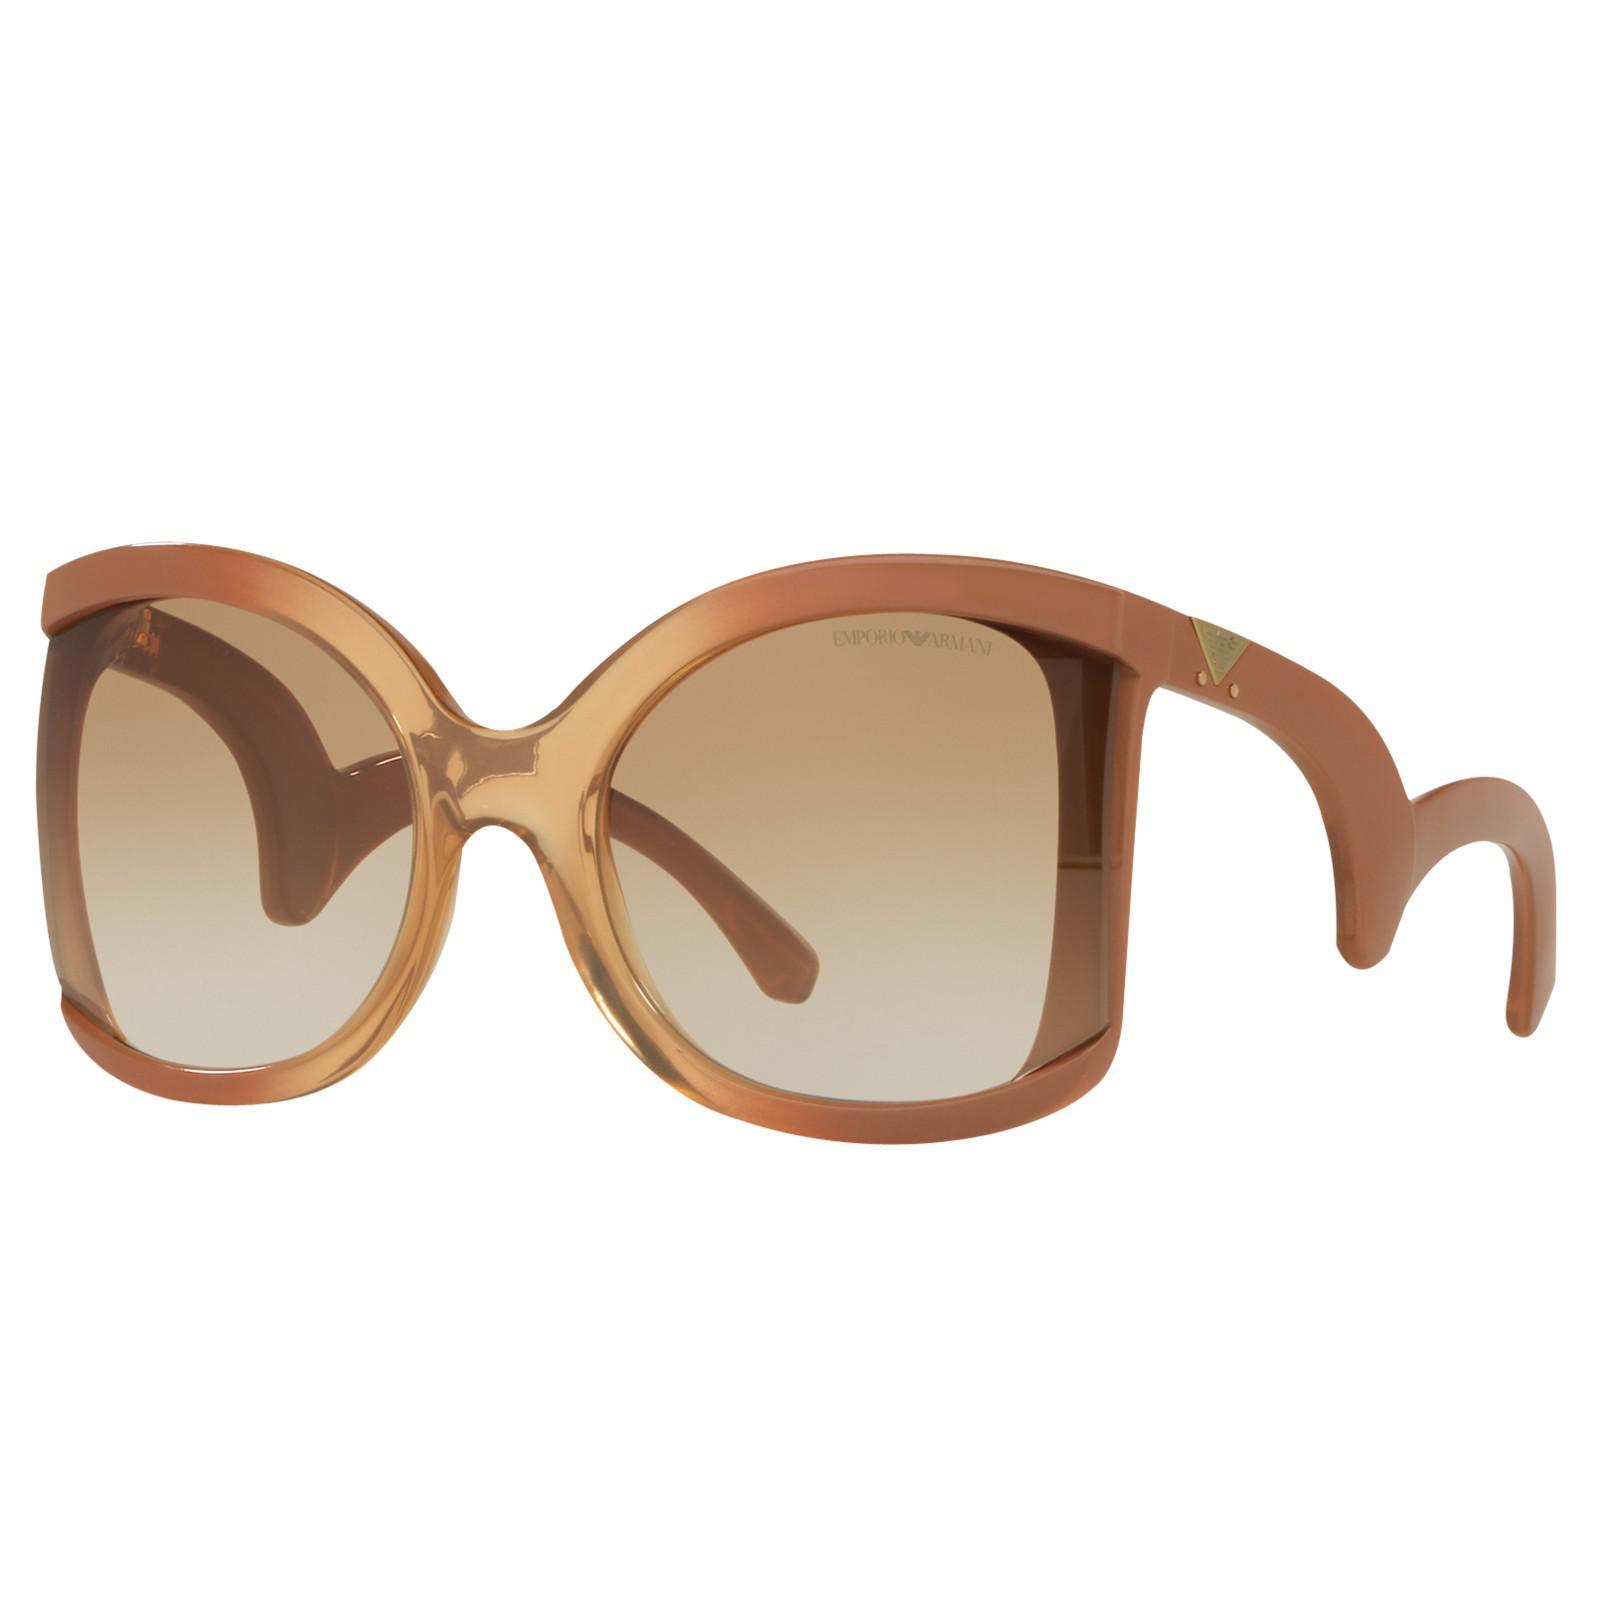 eafb6263d0 Sunglasses Lyst Ea4083 Eye Emporio Cat s Armani fn4pI0S